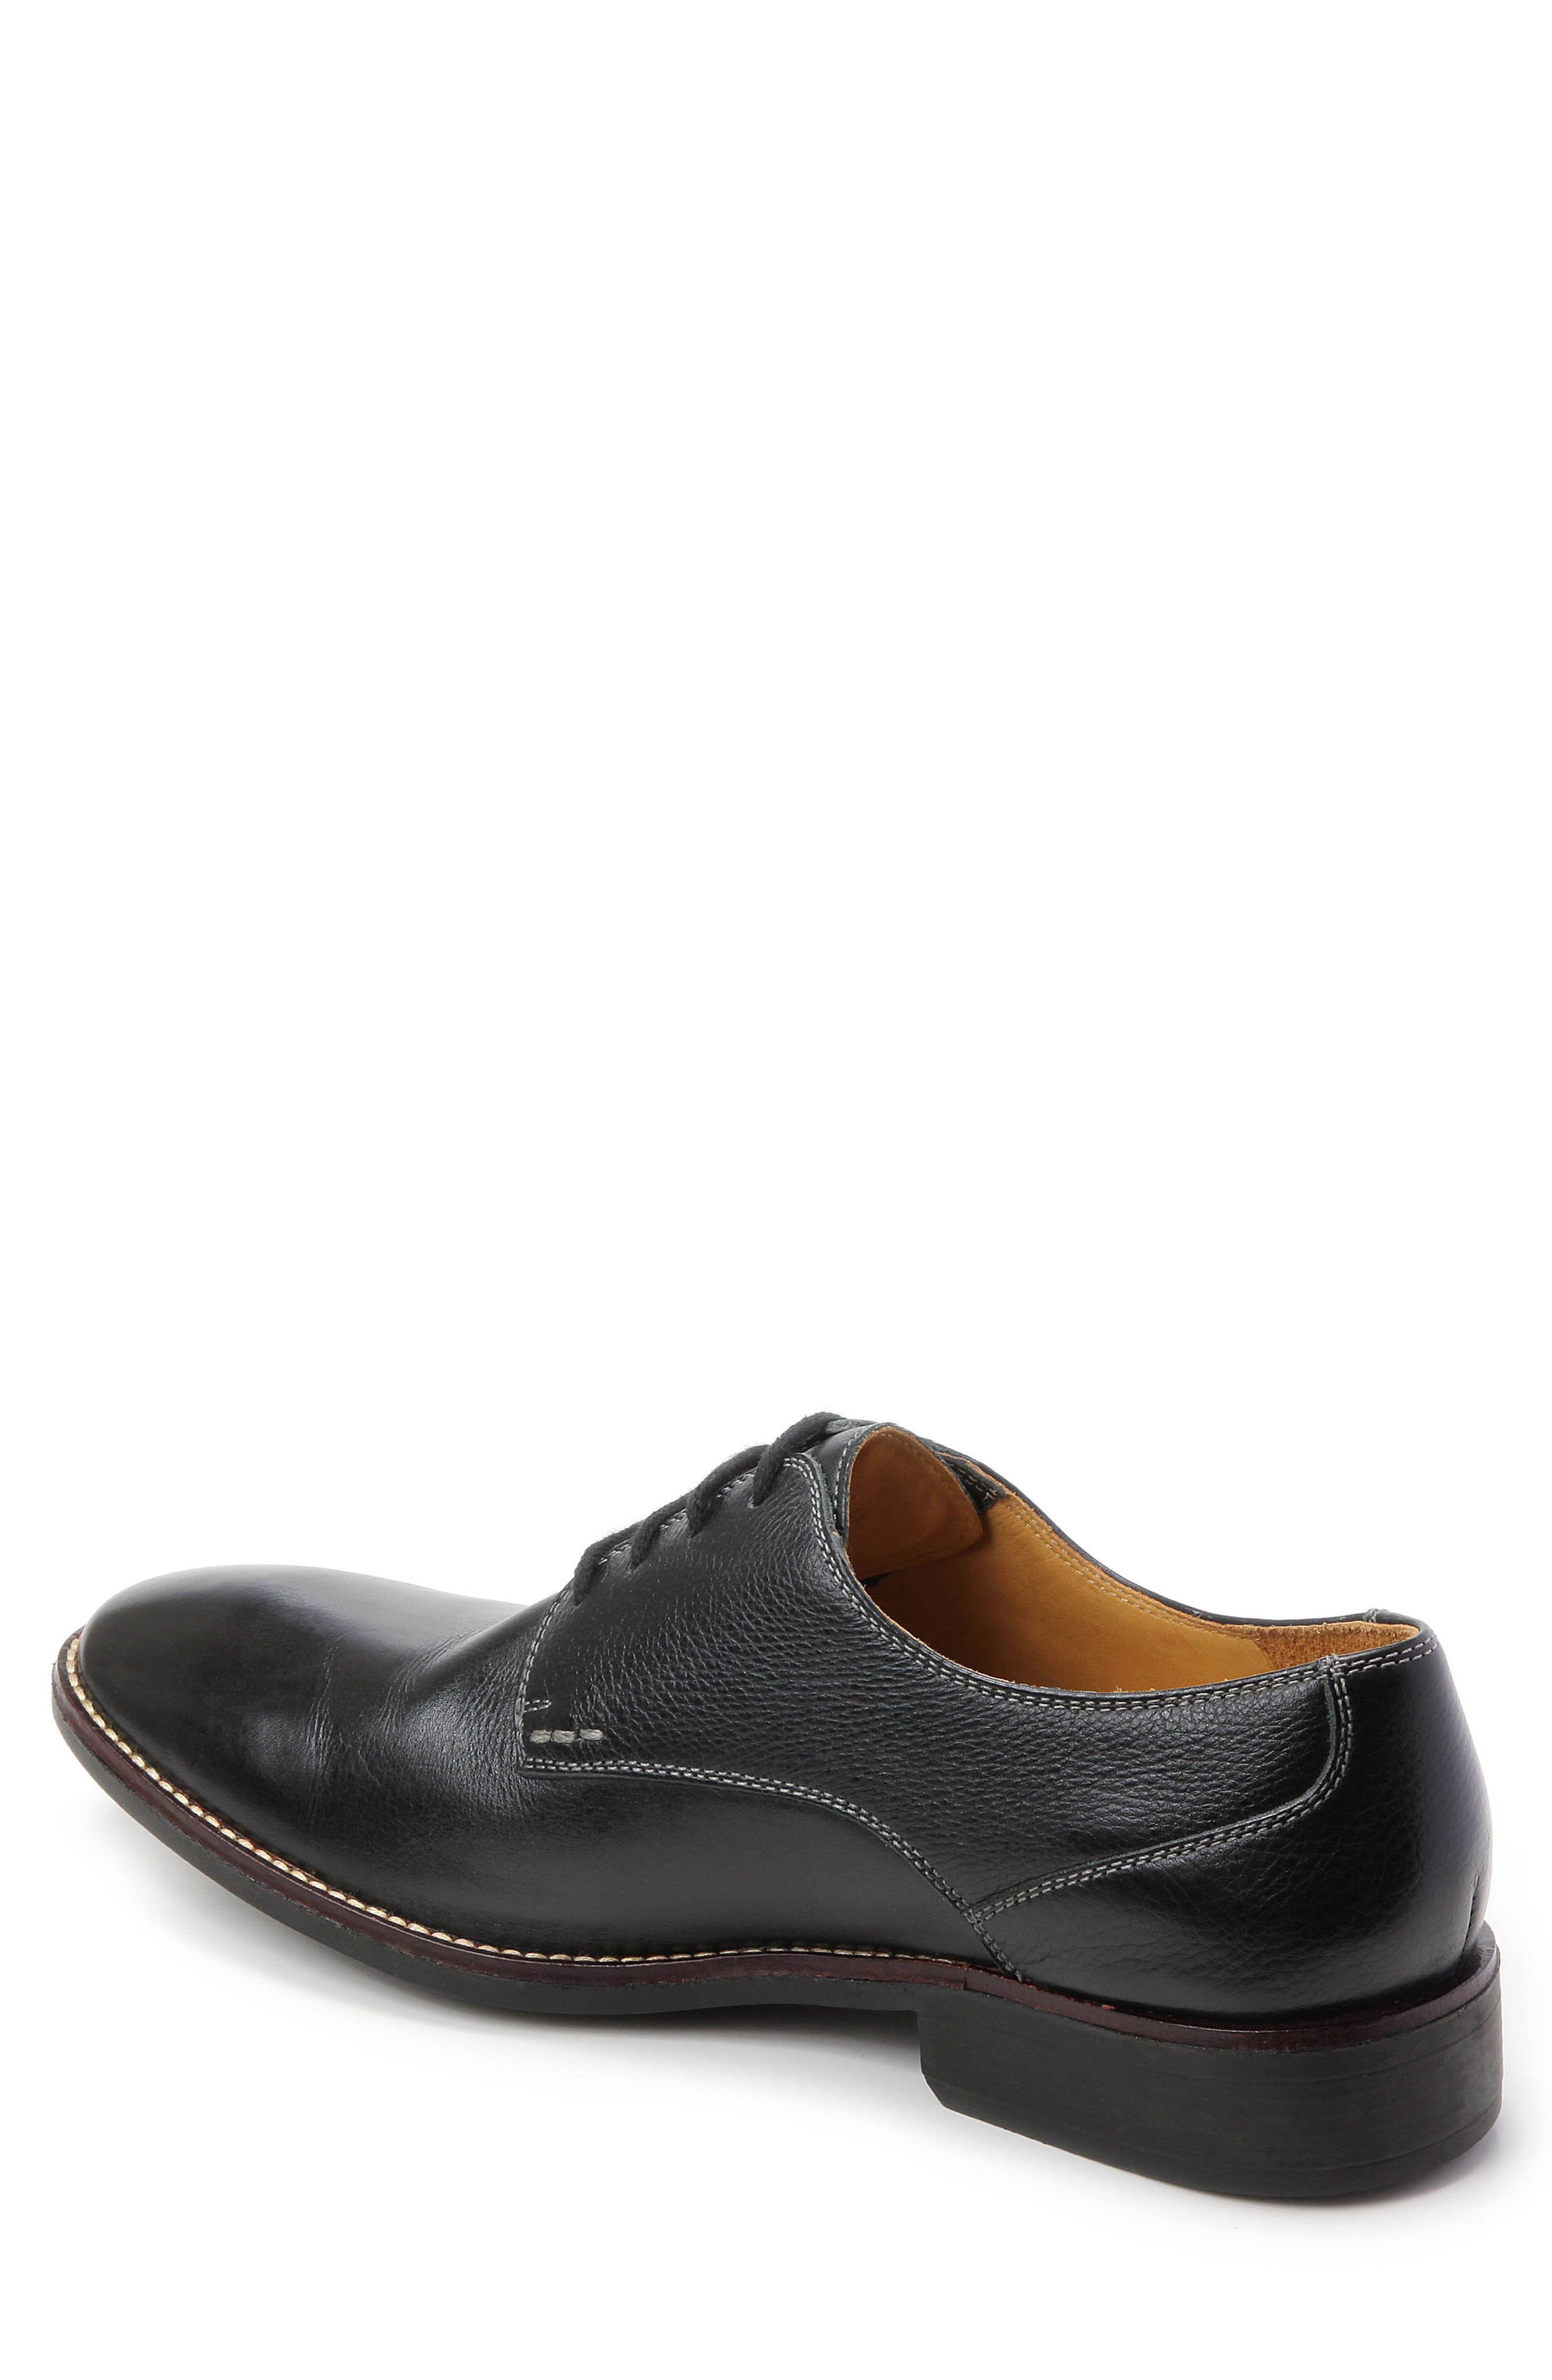 'Olsen' Plain Toe Derby,                             Alternate thumbnail 2, color,                             Black Leather